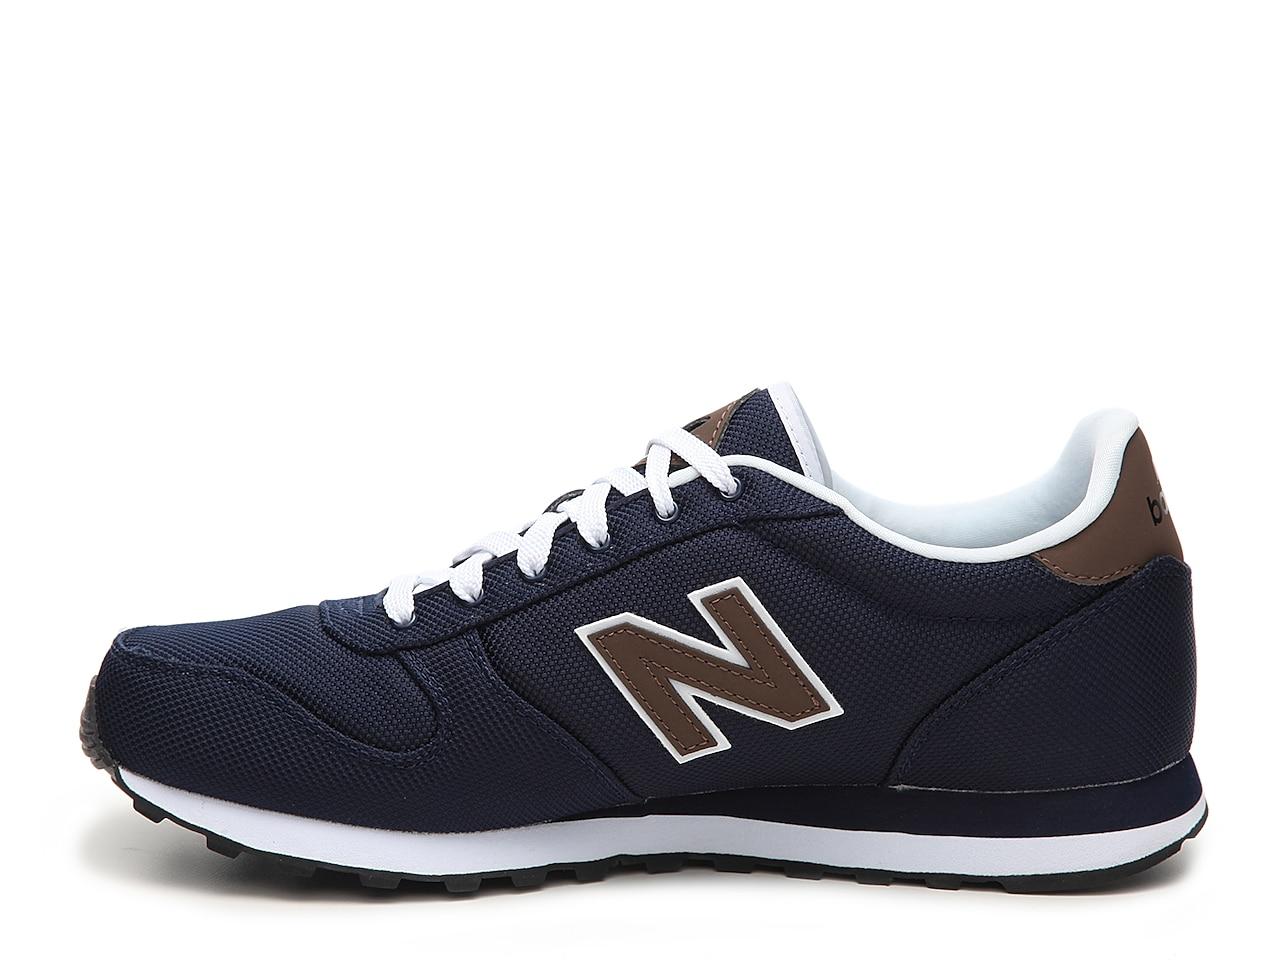 New Balance 311 Sneaker - Men's | DSW